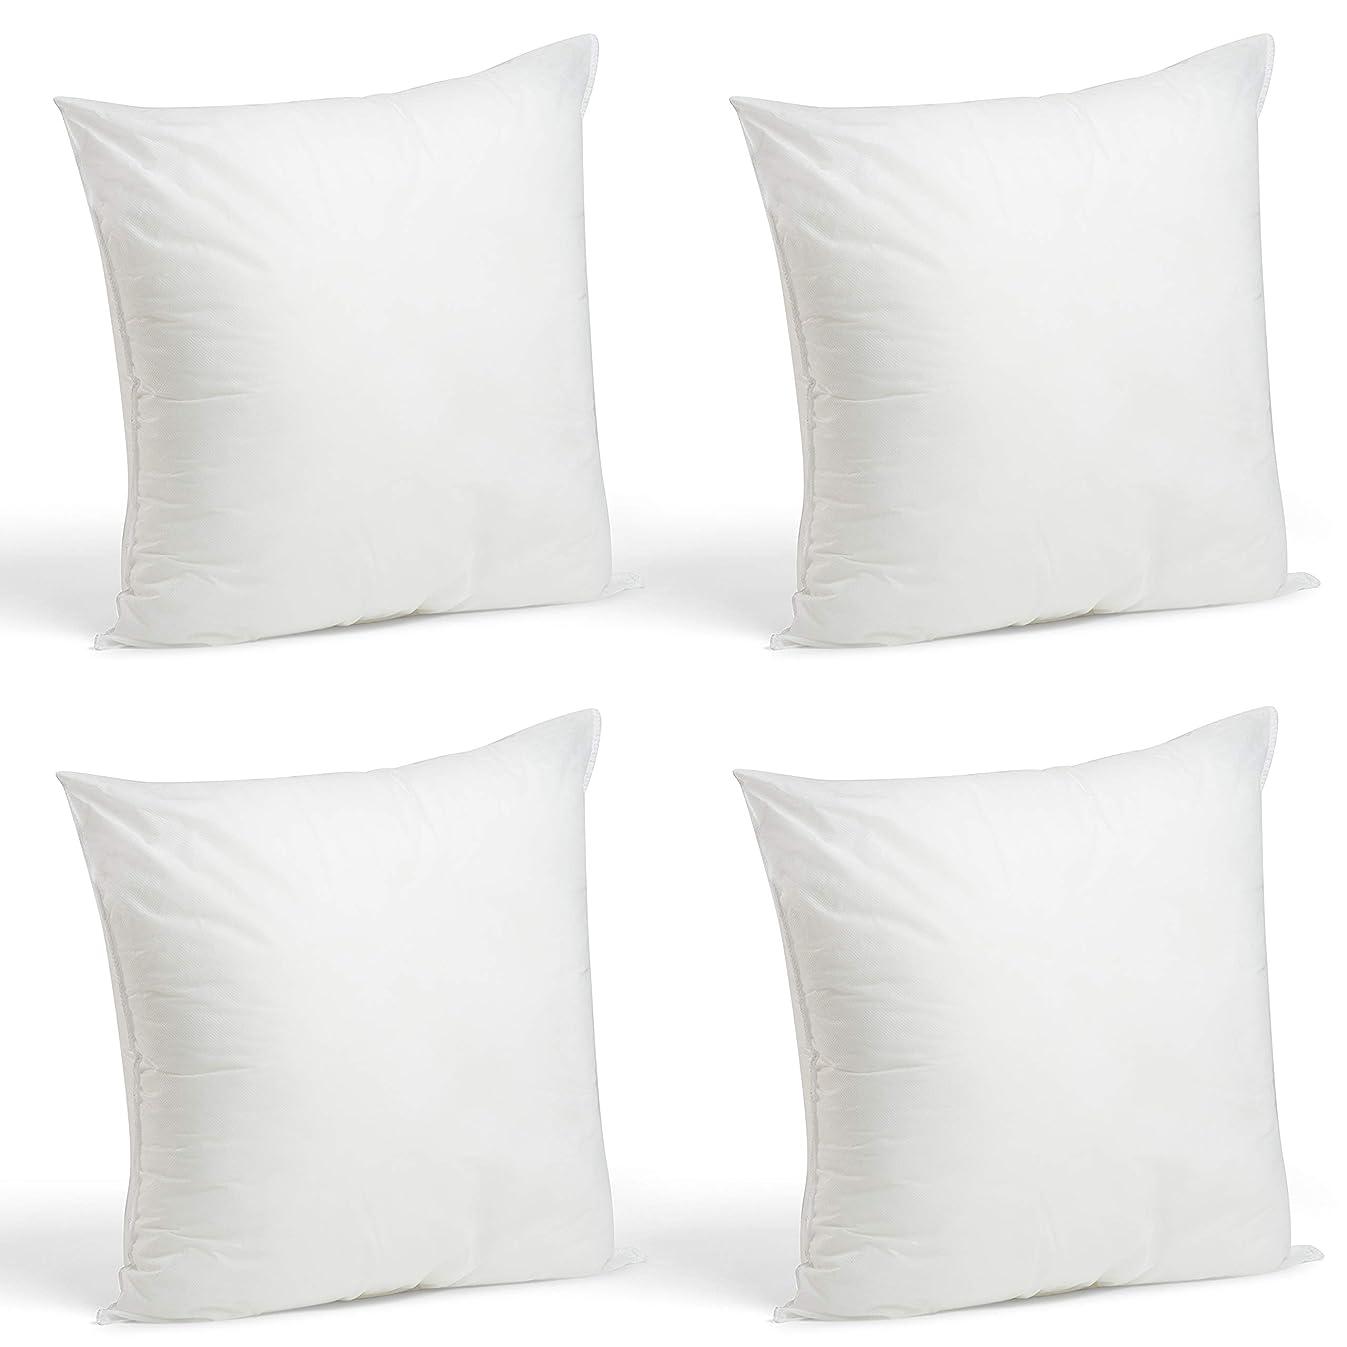 Foamily Set of 4-18 x 18 Premium Hypoallergenic Stuffer Pillow Inserts Sham Square Form Polyester, 18